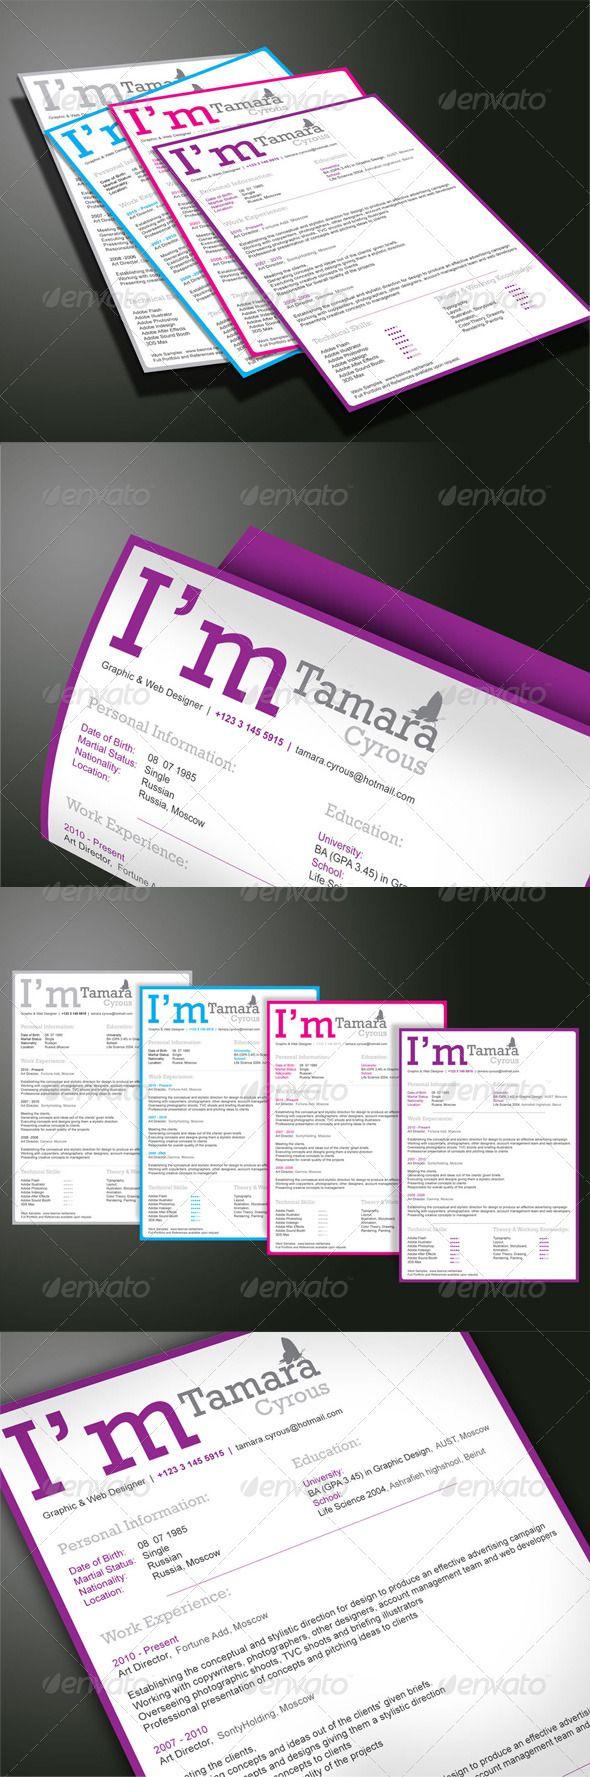 Buy professional resume templates